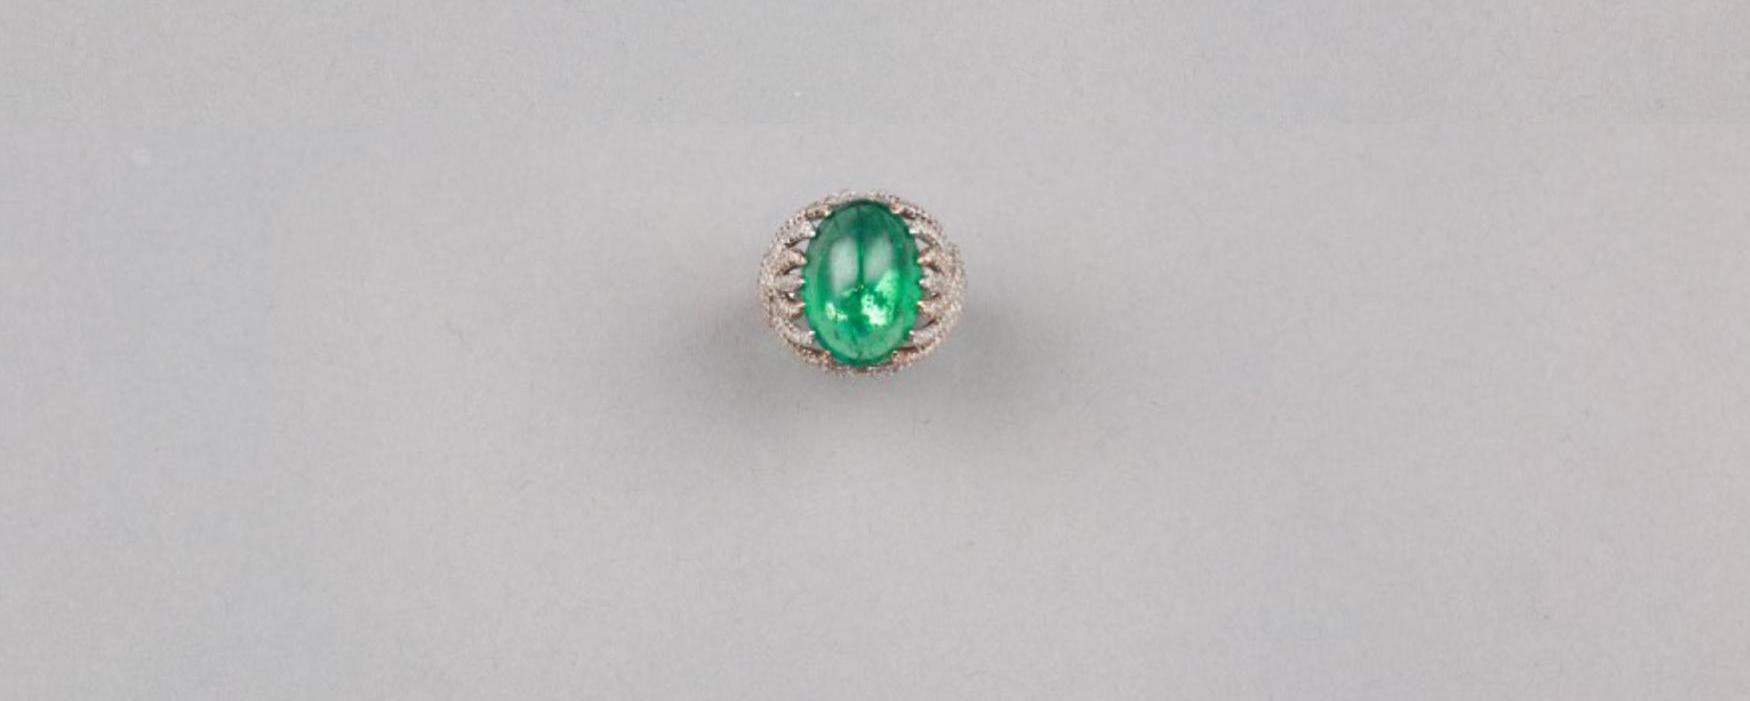 Lot 56 - An Oval-shaped Emerald Diamond Ring